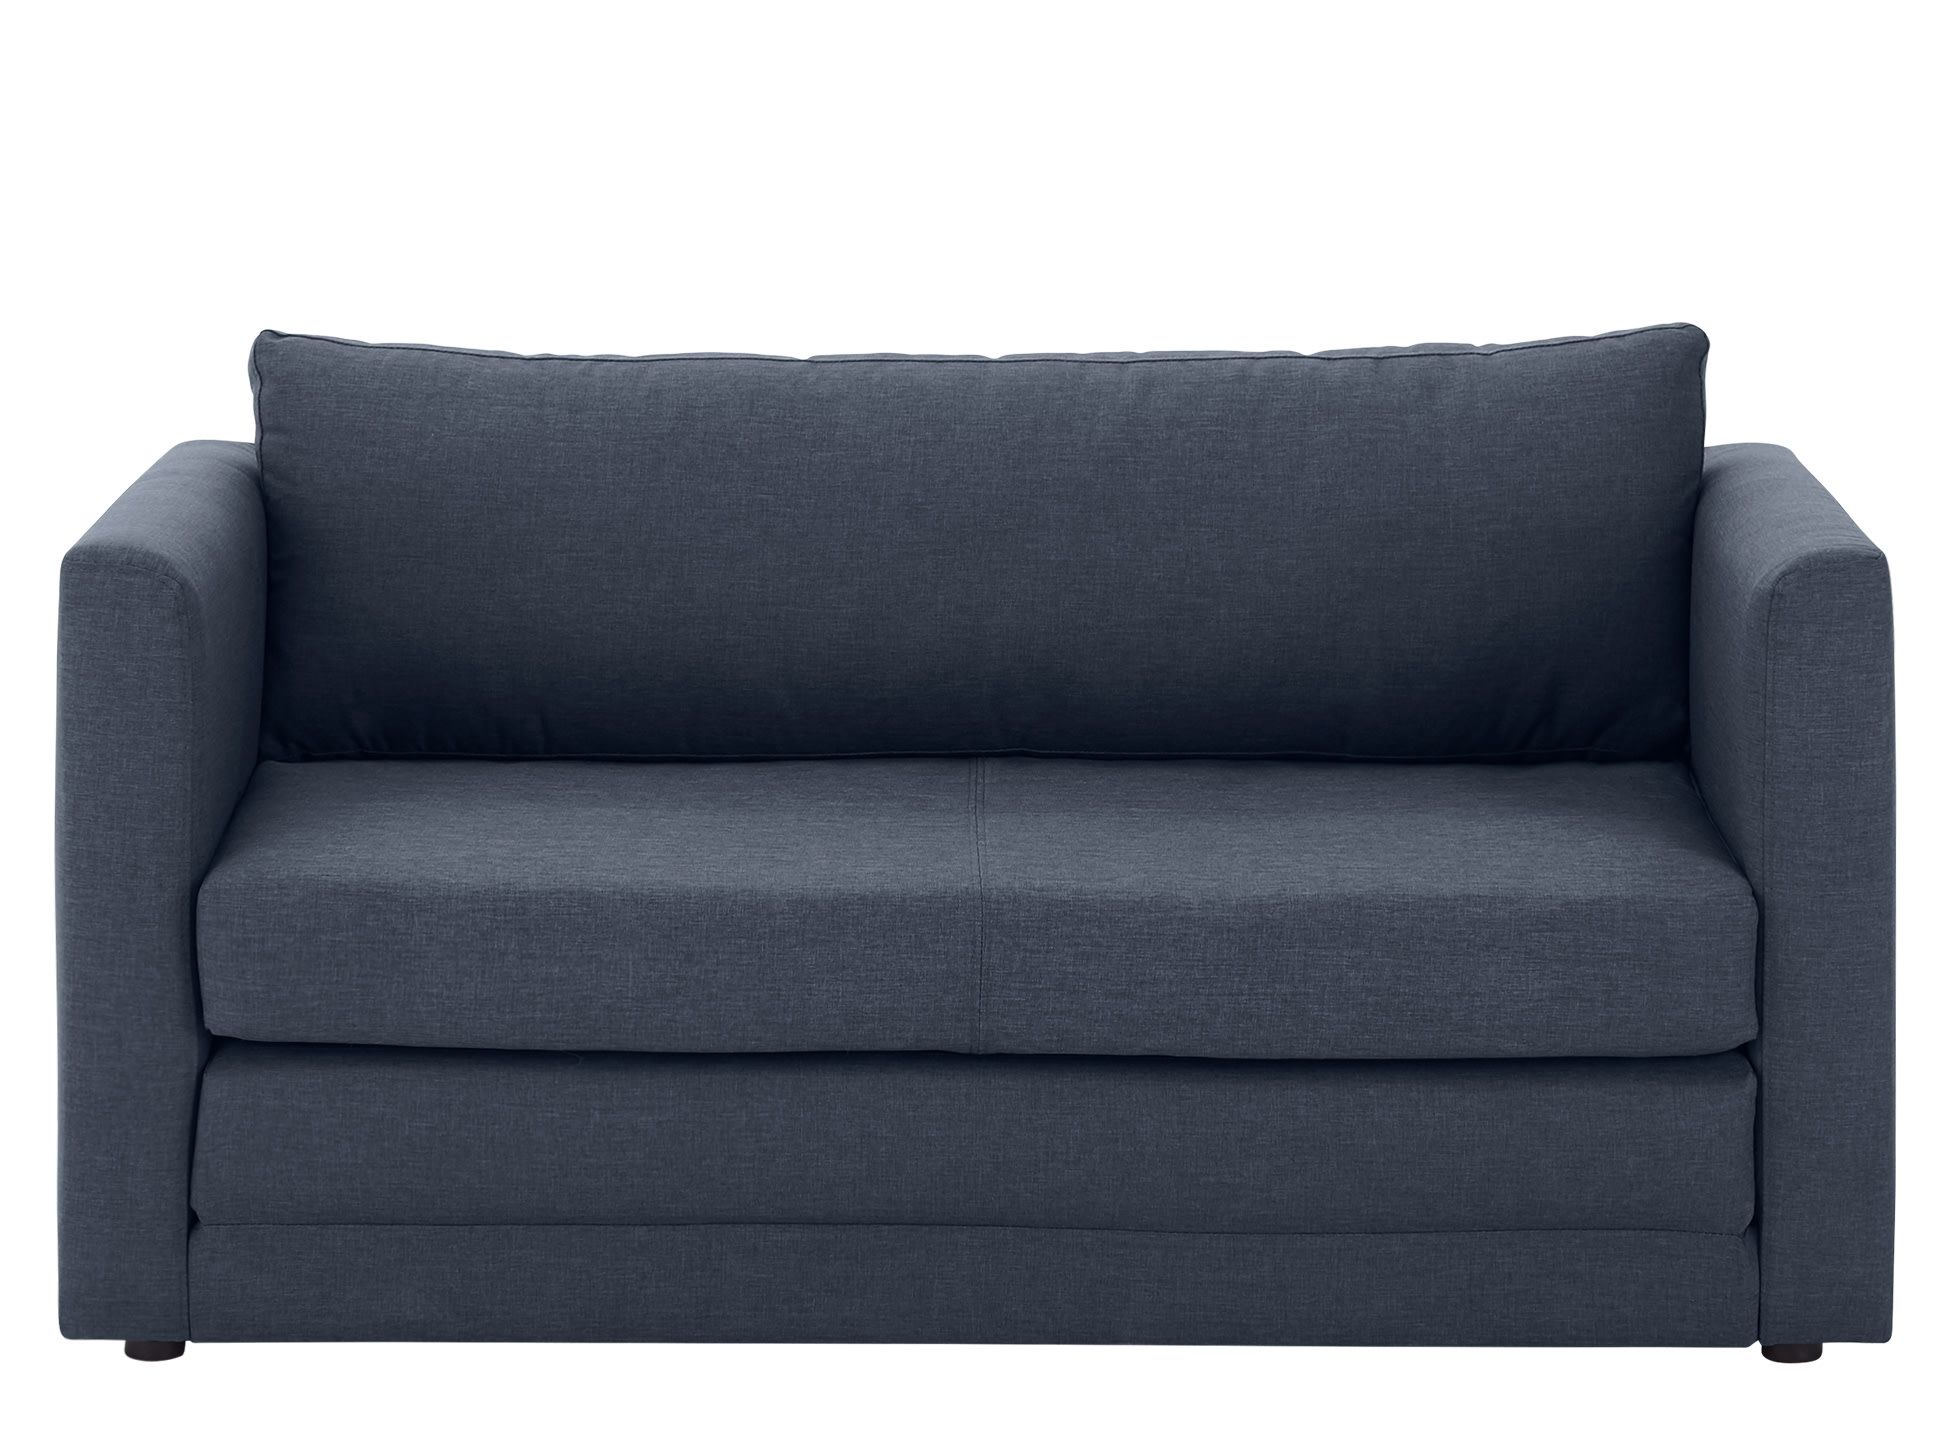 Made Essentials Eli Sofa Bed Quartz Blue Small Sofa Small Sofa Bed Sofa Bed